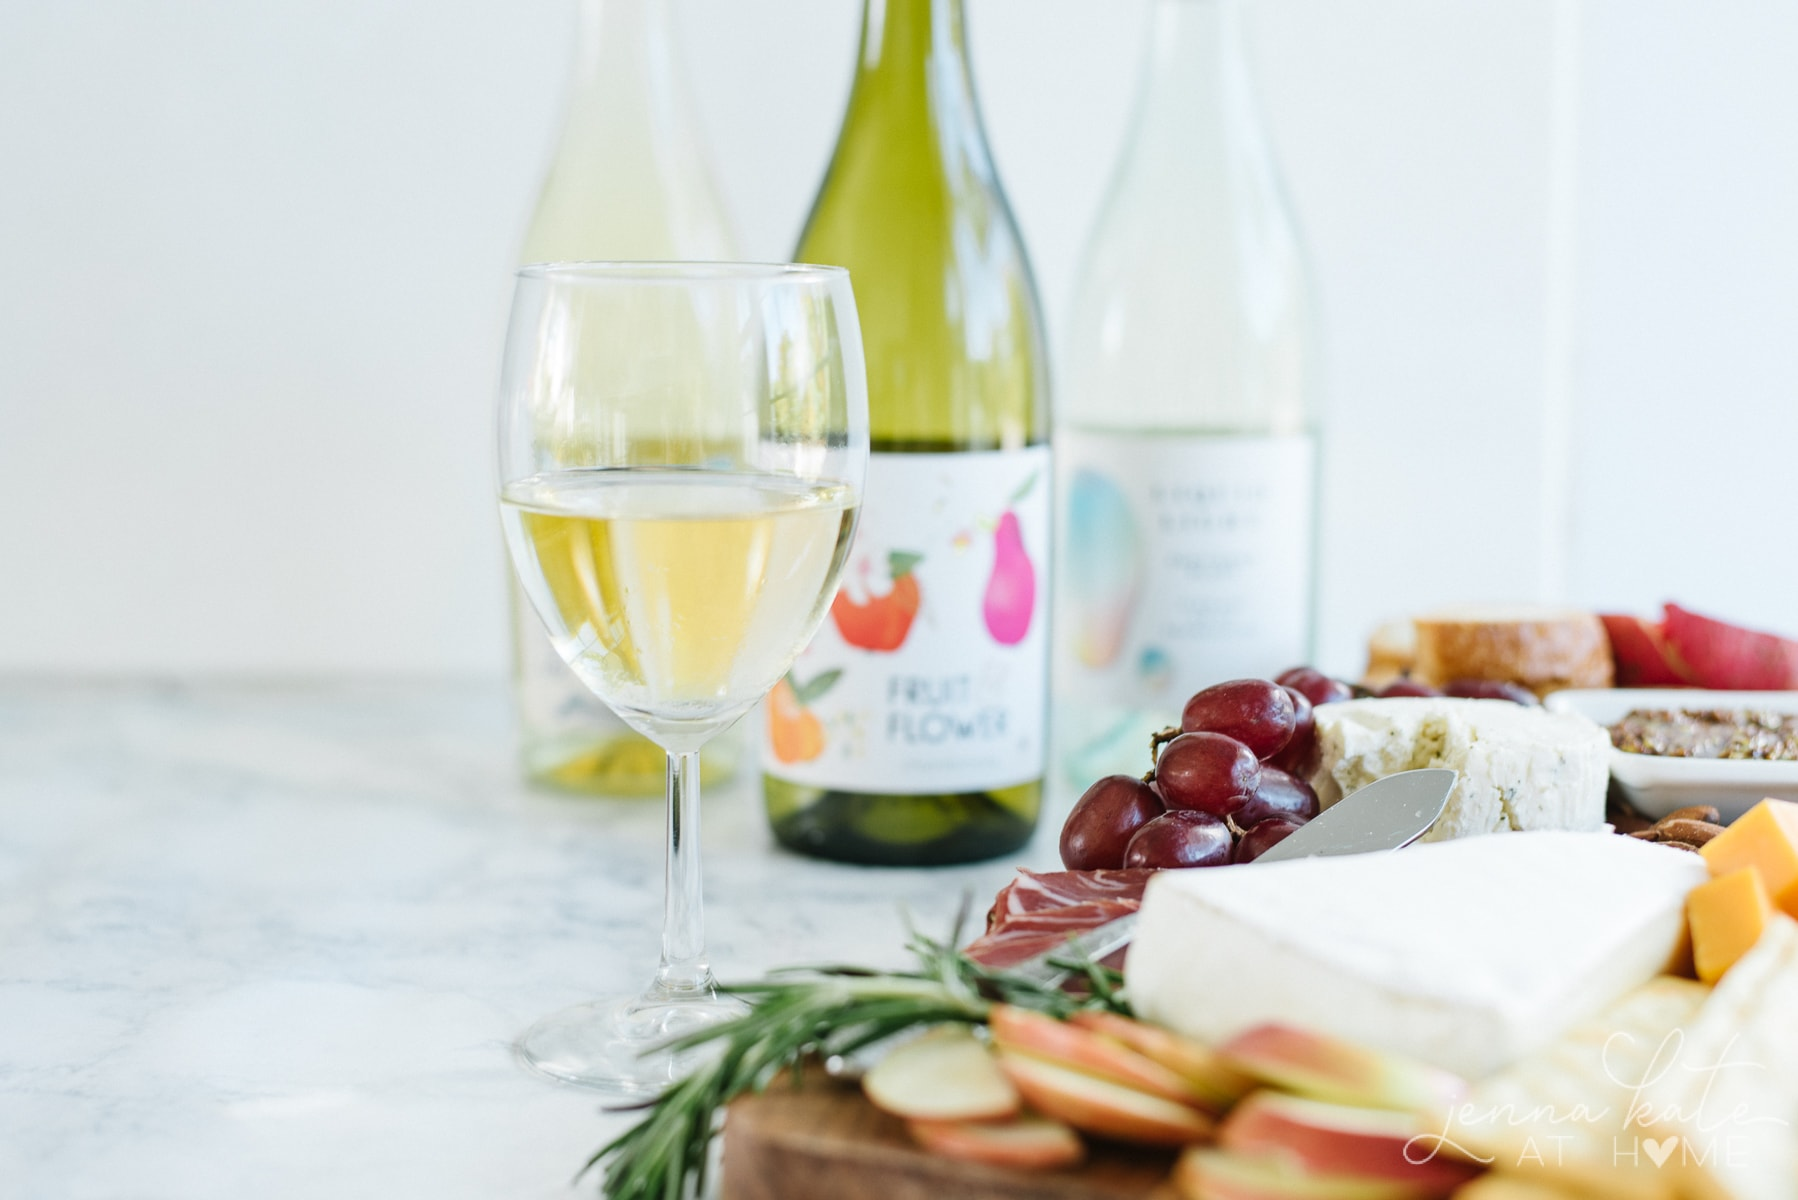 A glass of Sauvignon Blanc alongside a charcuterie board